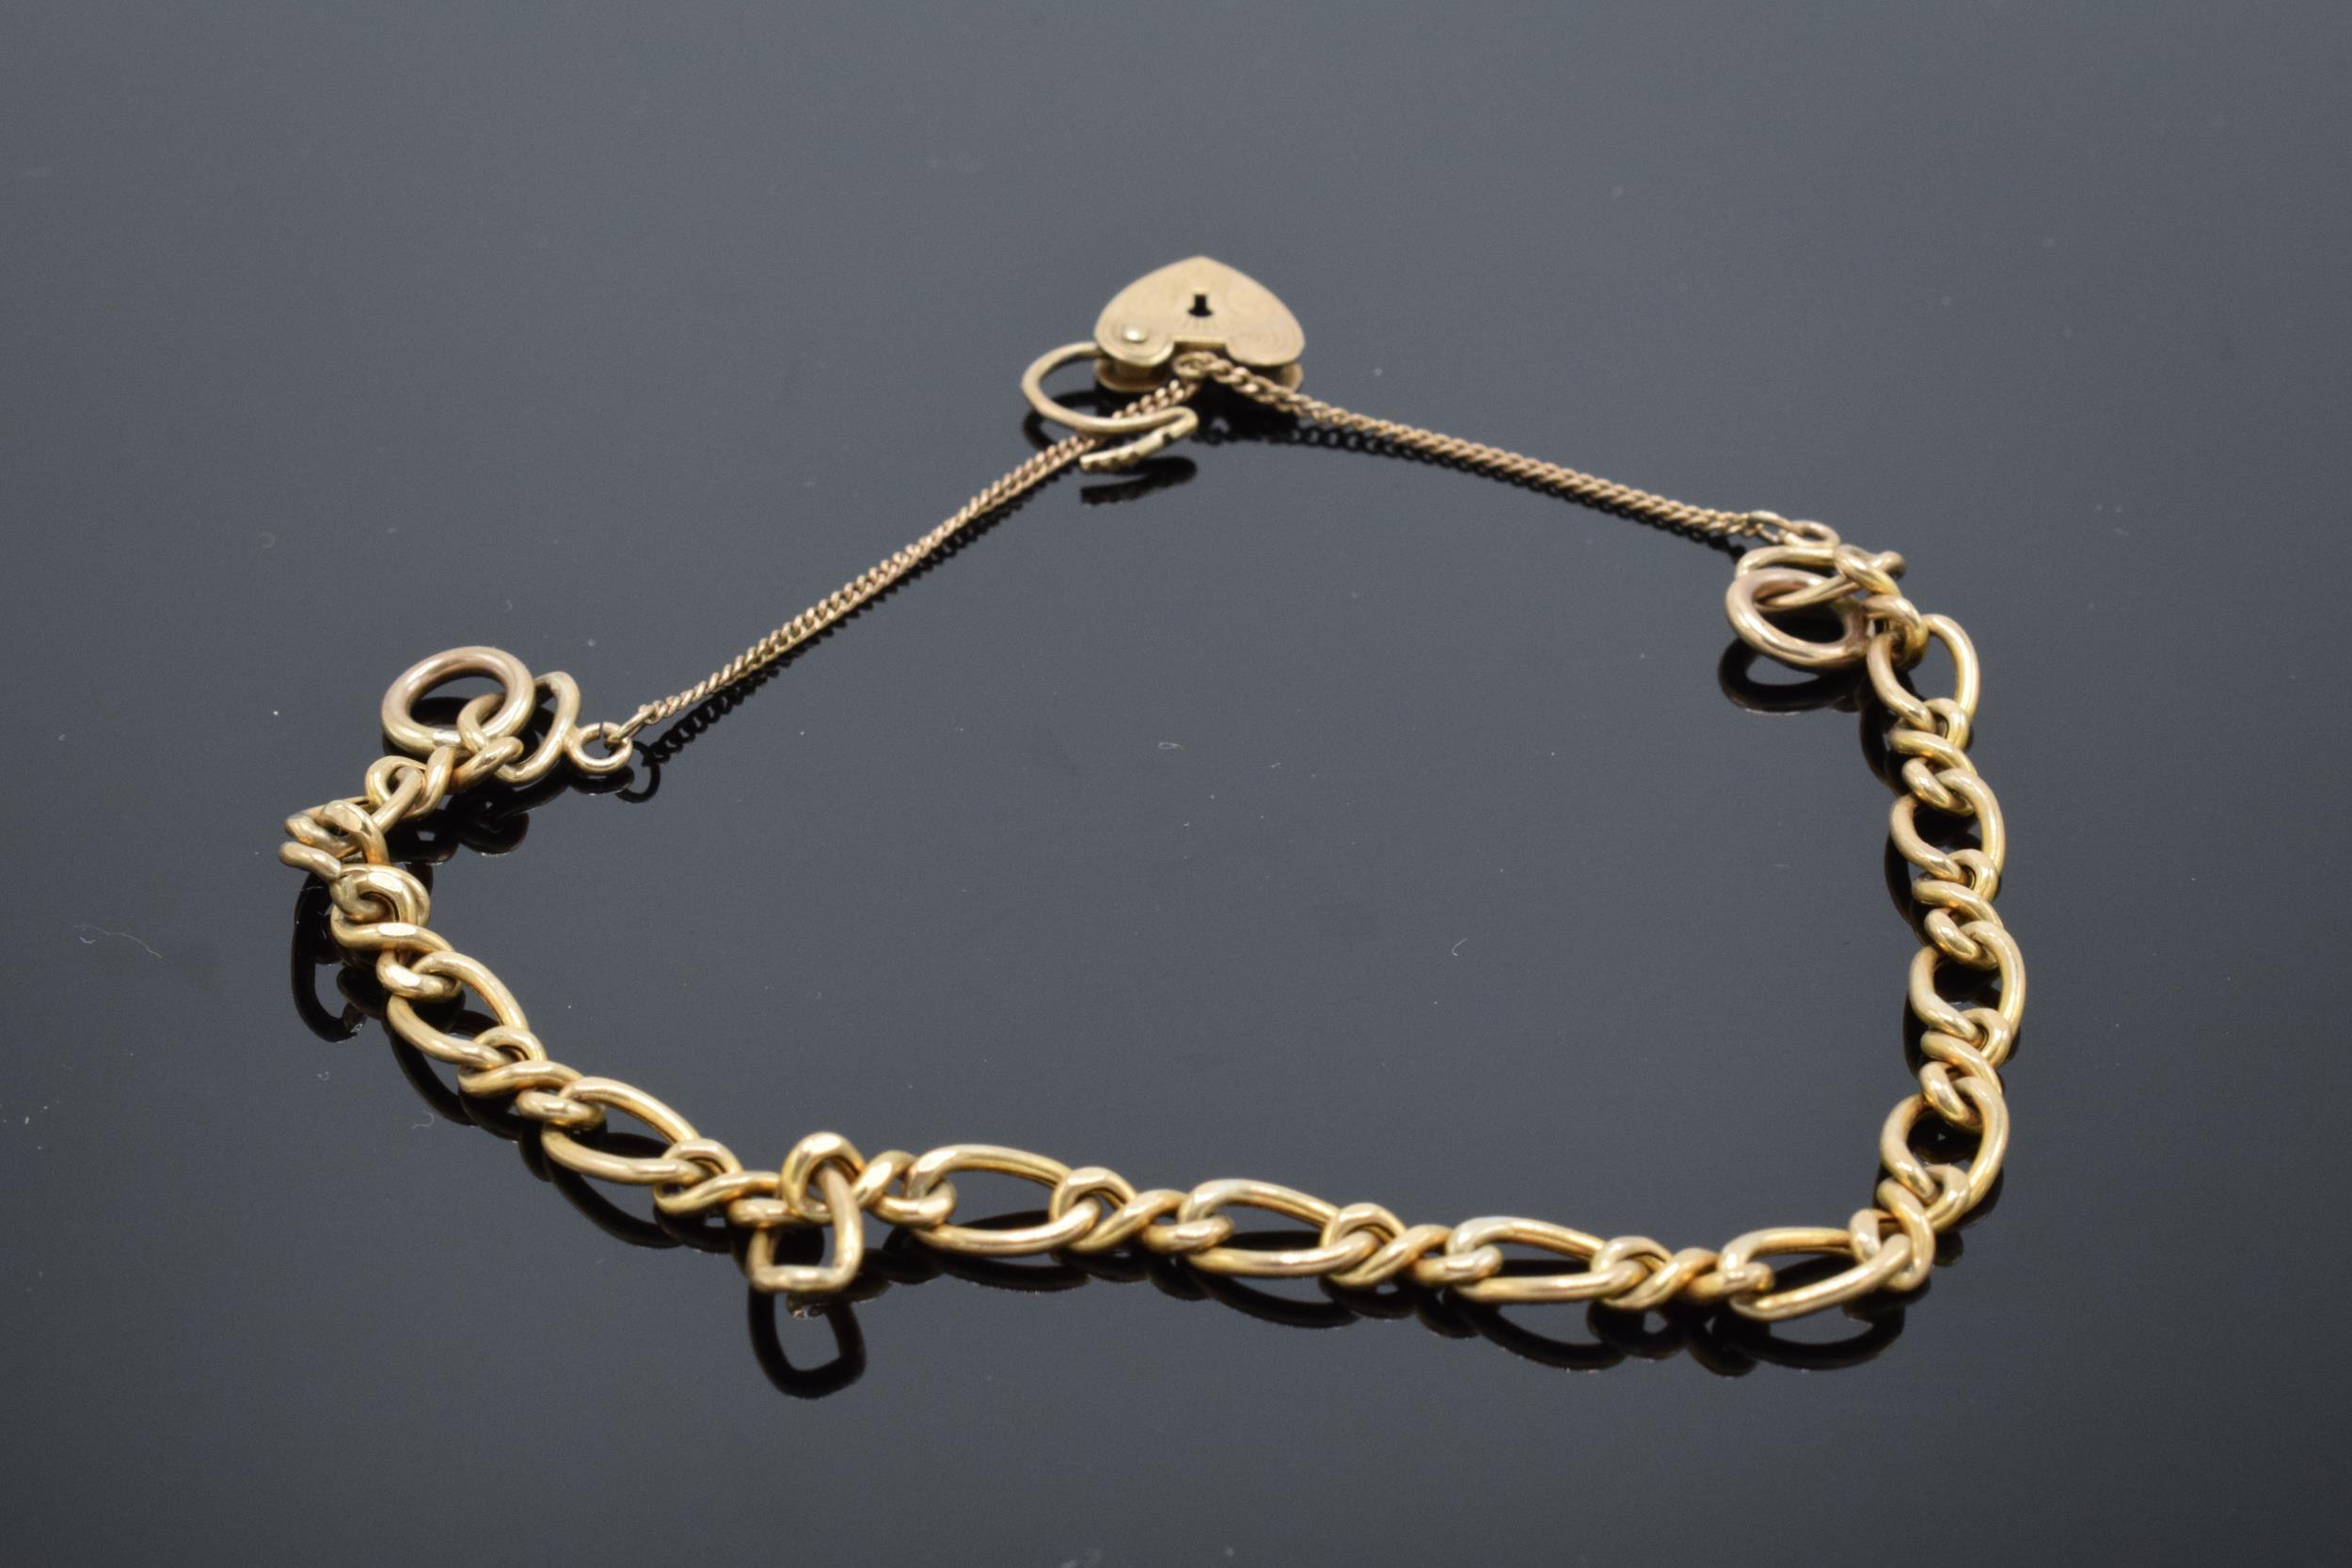 9ct gold charm bracelet 5.2g - Image 2 of 3